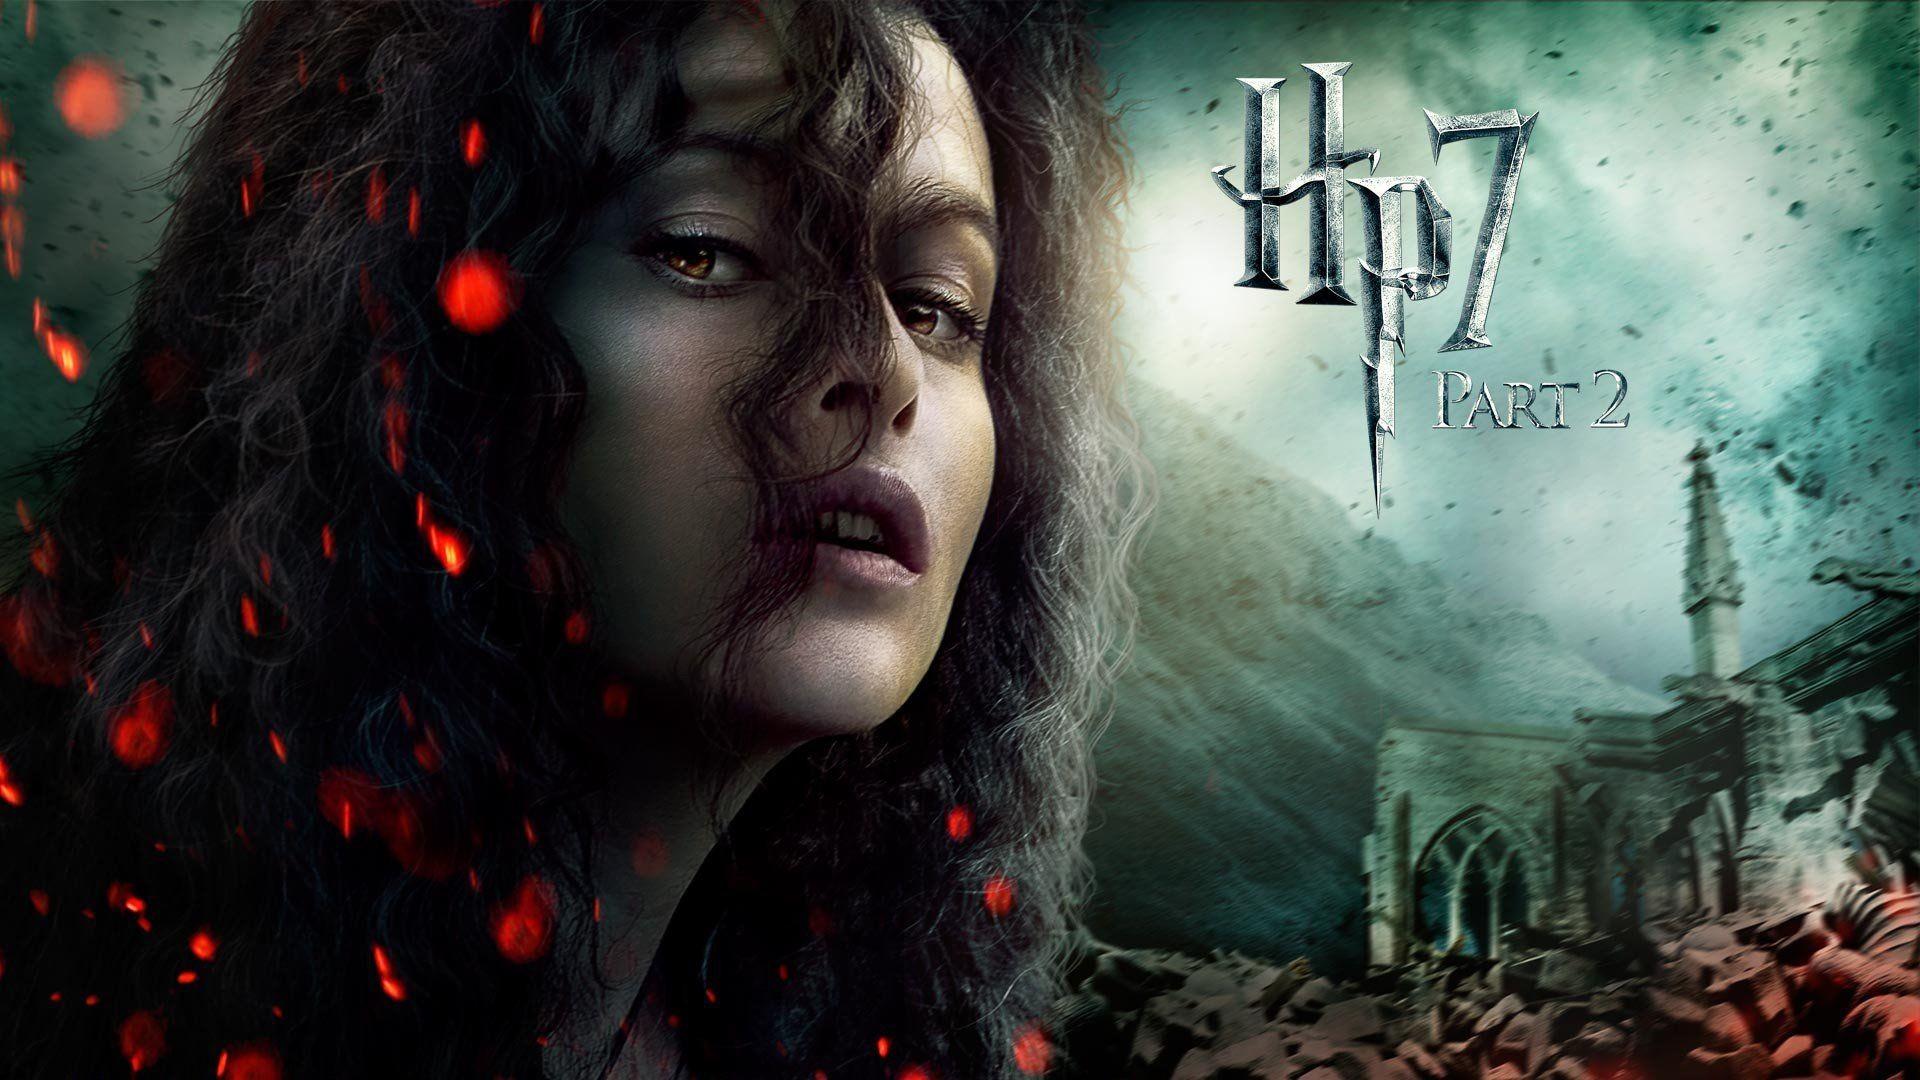 Helena Bonham Carter Harry Potter Movie Wallpaper – 1080p Full HD Wallpaper